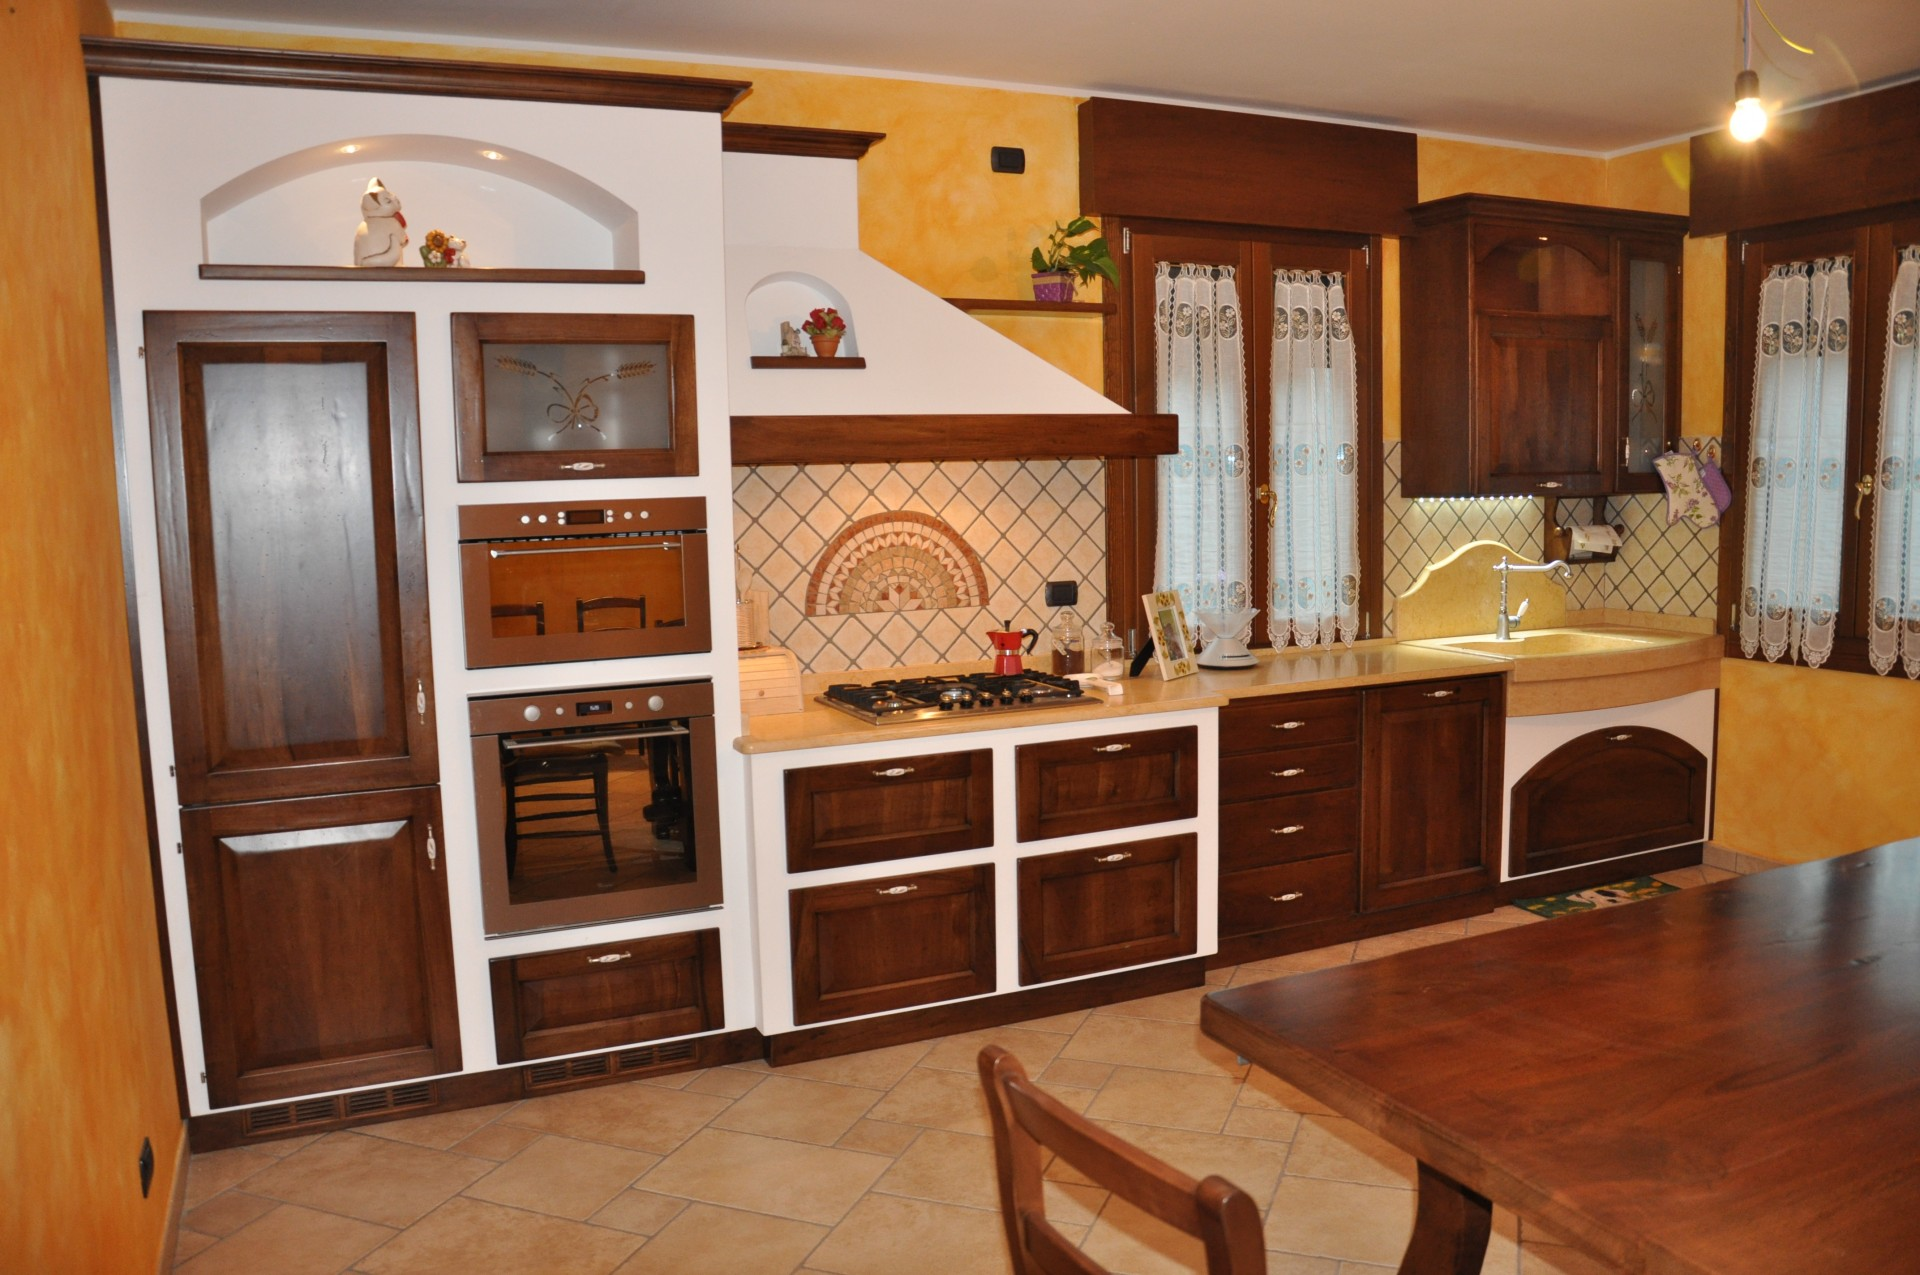 Cucina in muratura fadini mobili cerea verona for Cucine in muratura rustiche